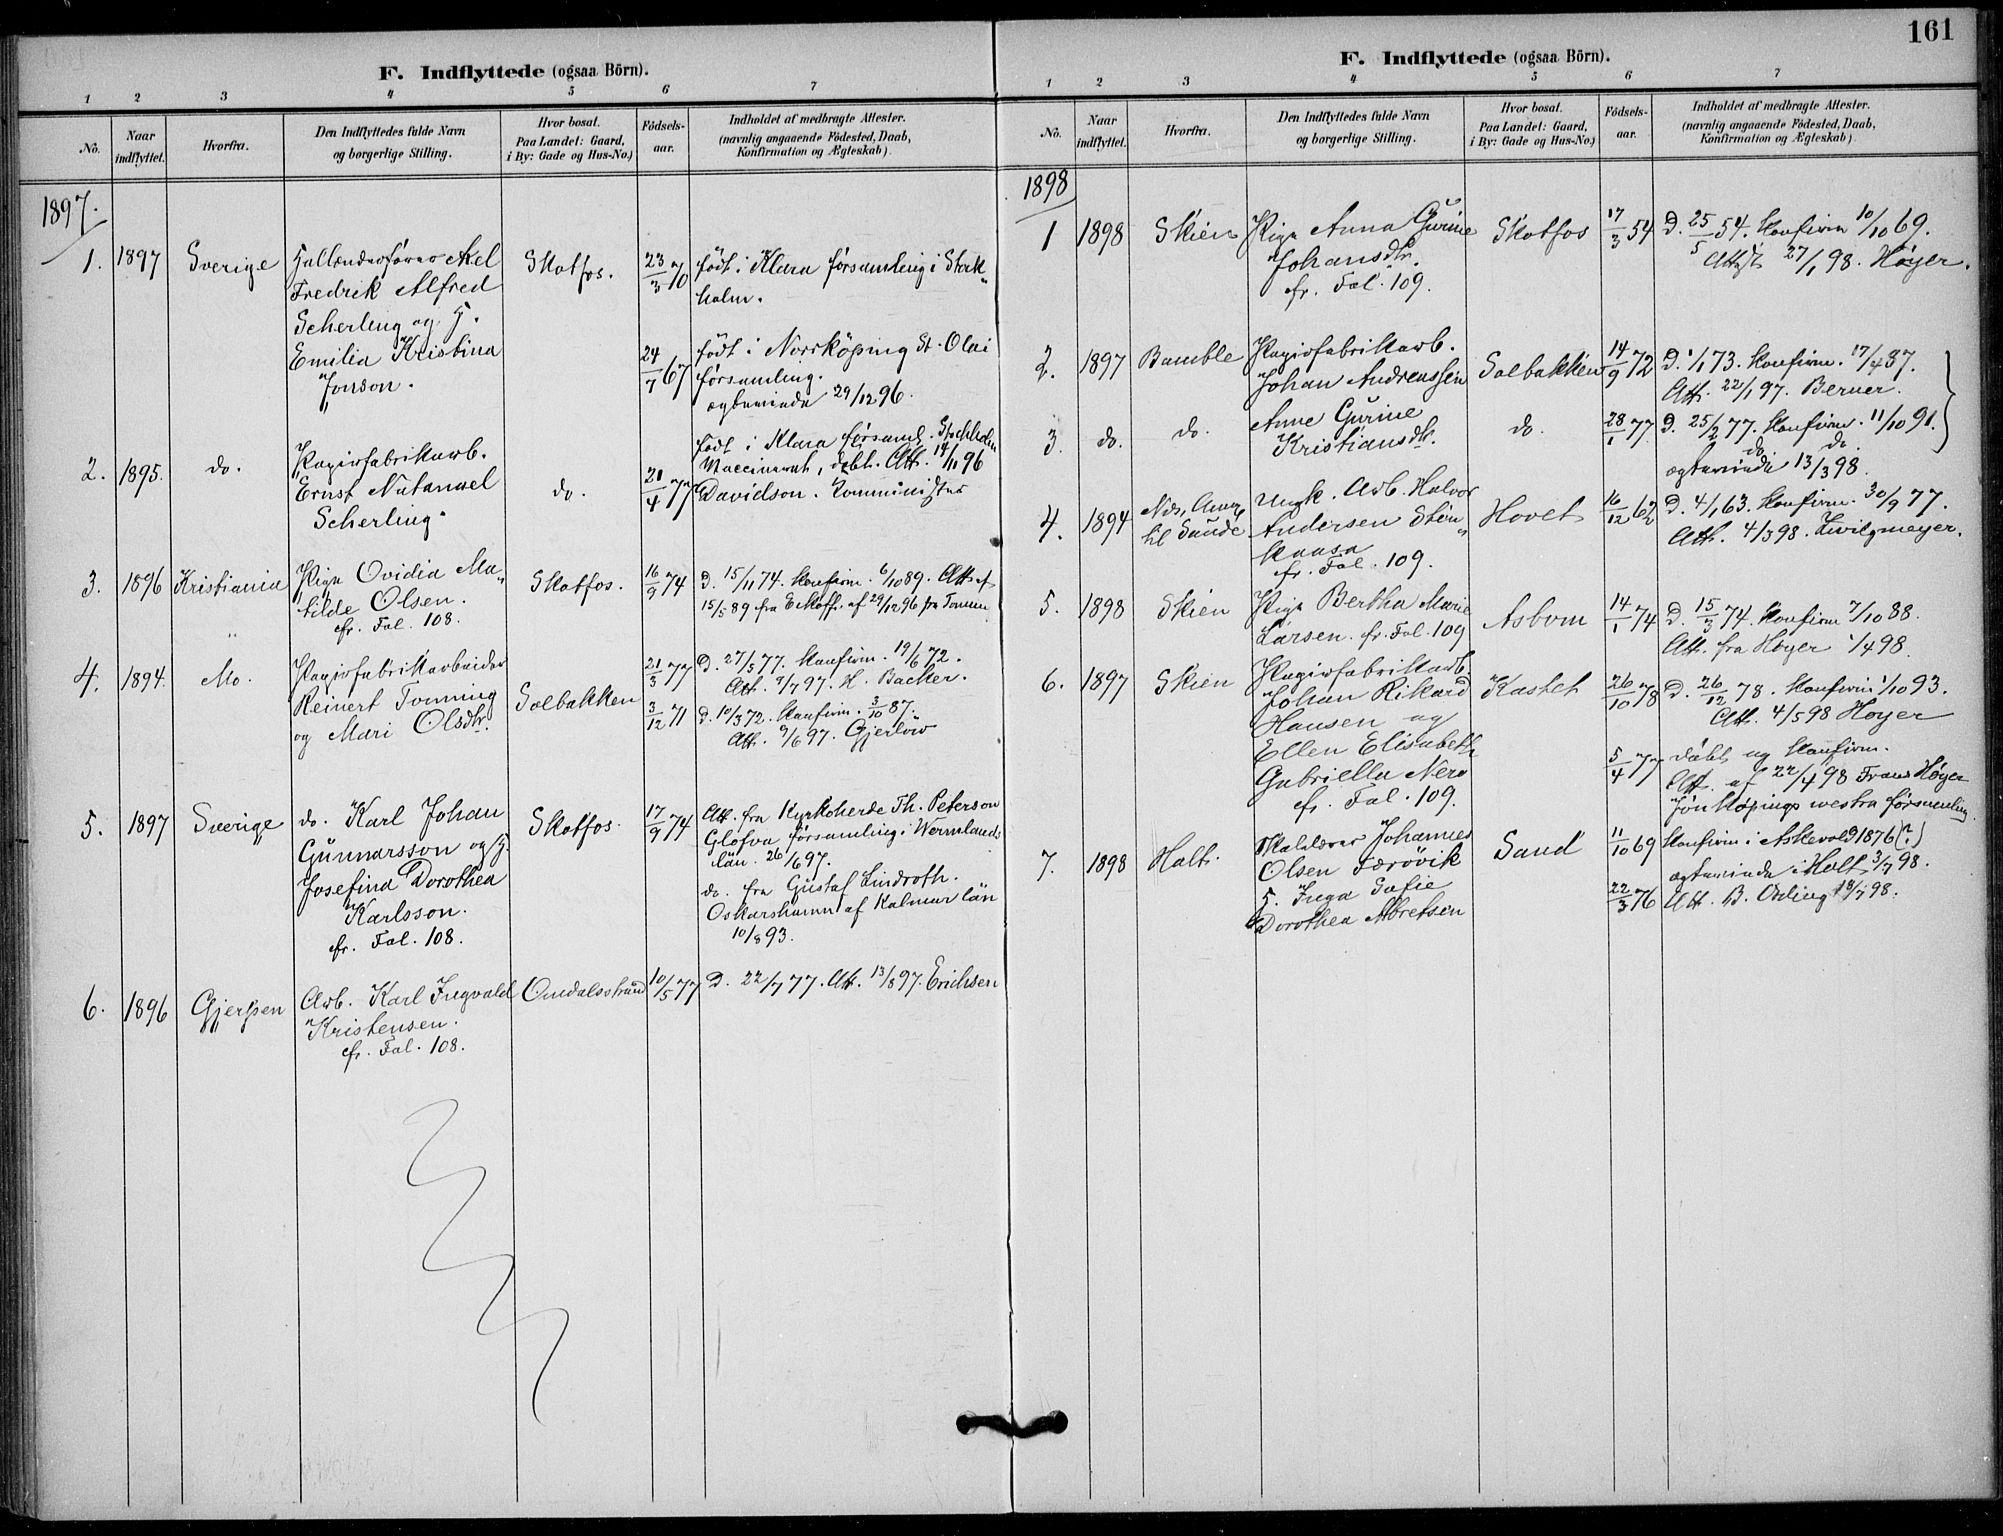 SAKO, Solum kirkebøker, F/Fb/L0002: Ministerialbok nr. II 2, 1893-1901, s. 161